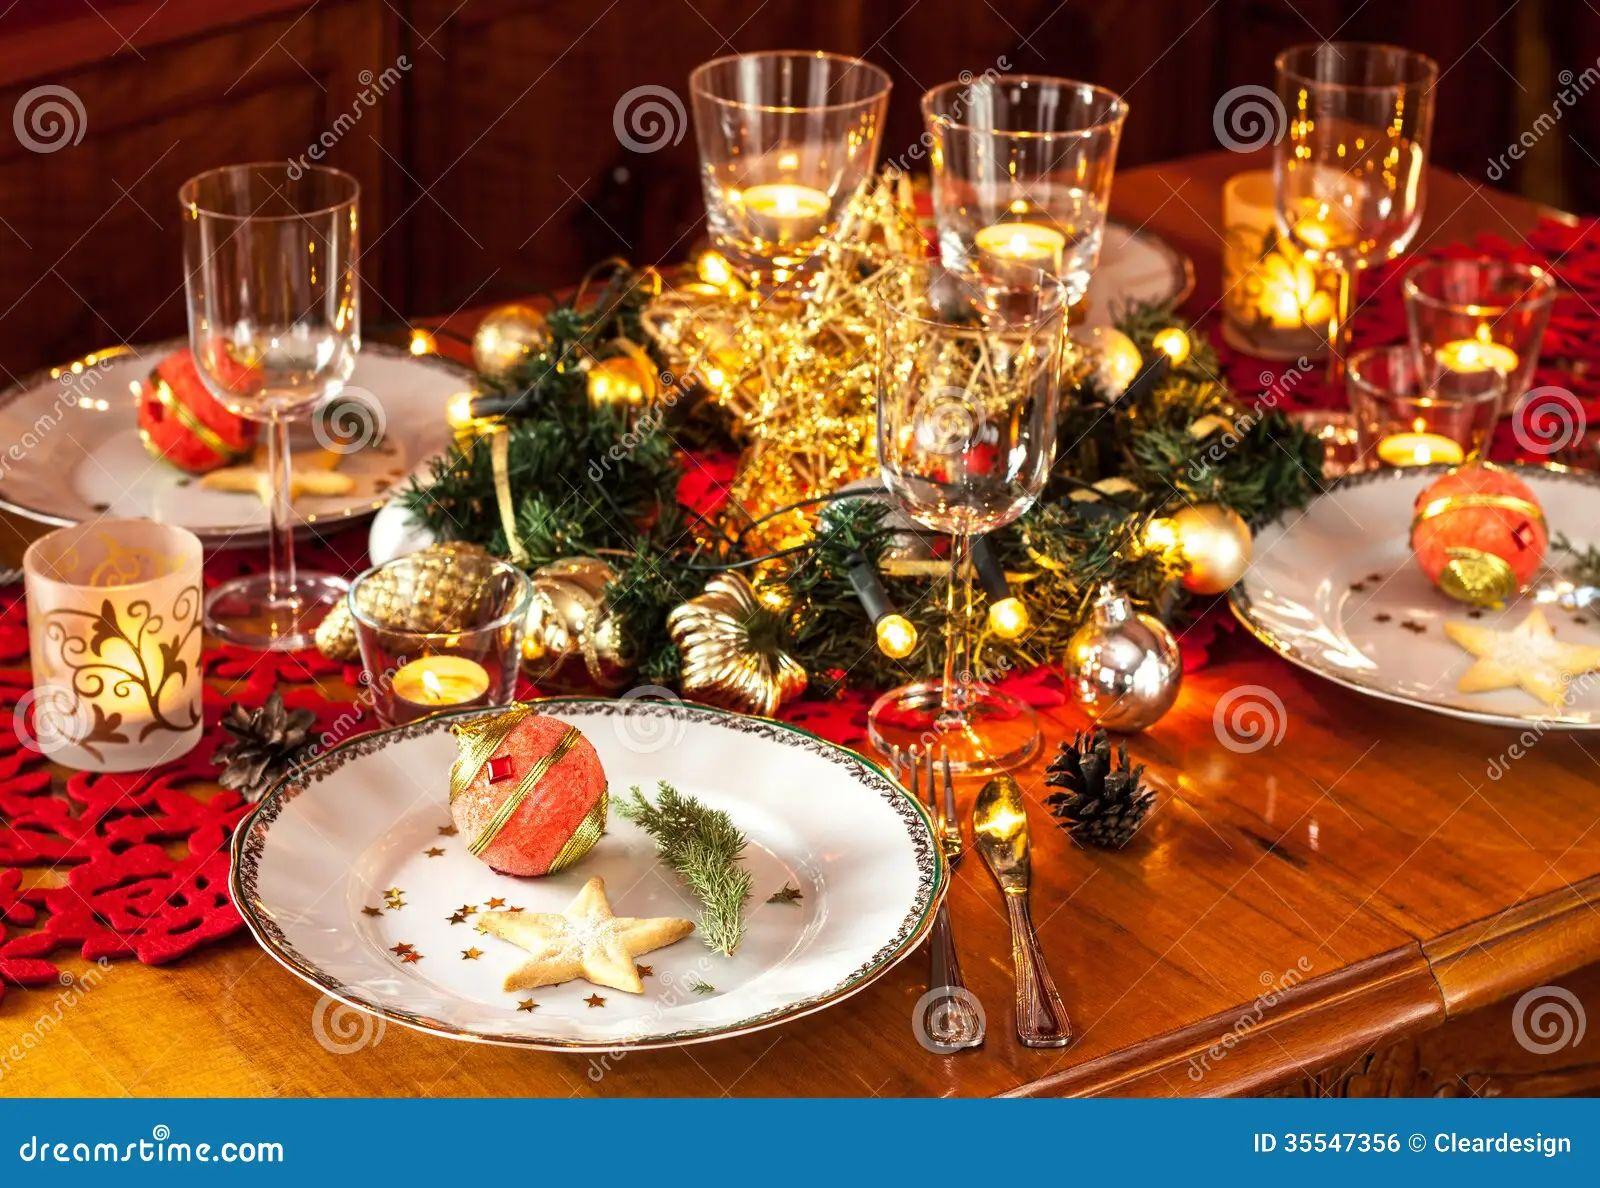 Christmas dinner elegant eve gold lights party setting table